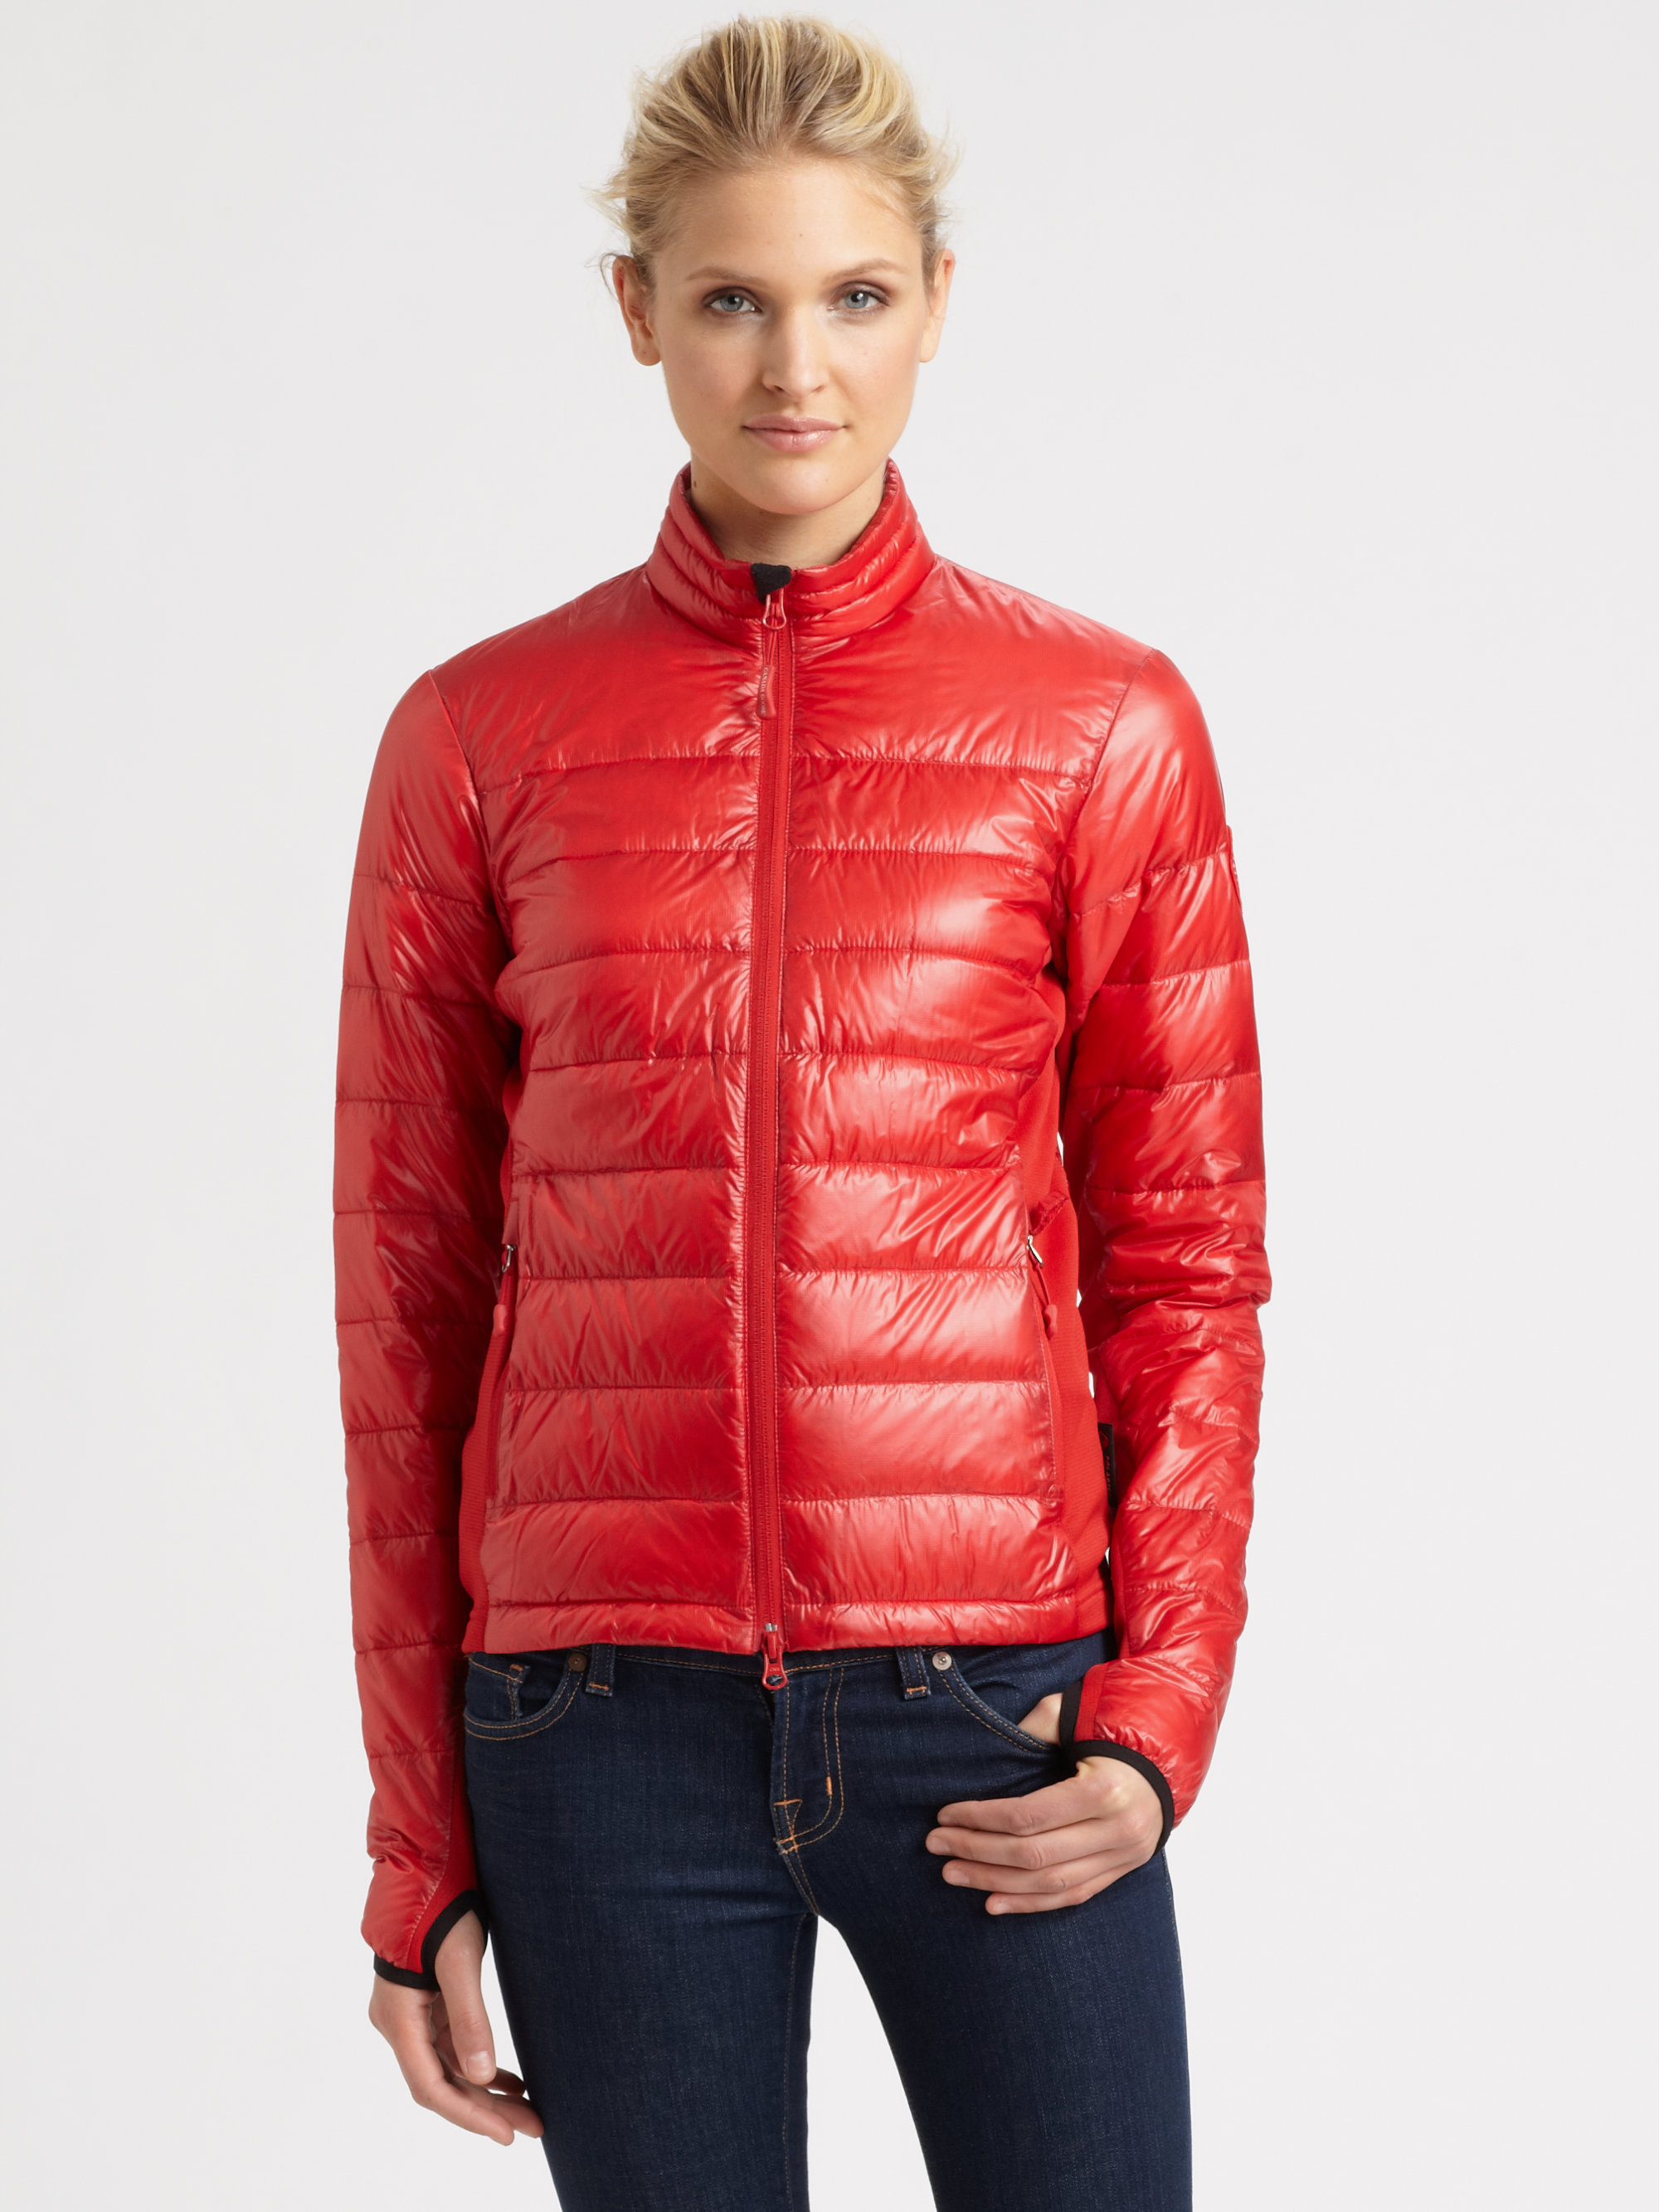 Canada Goose jackets sale fake - canada-goose-red-hybridge-lite-jacket-product-1-7658426-2-286667326-normal.jpeg